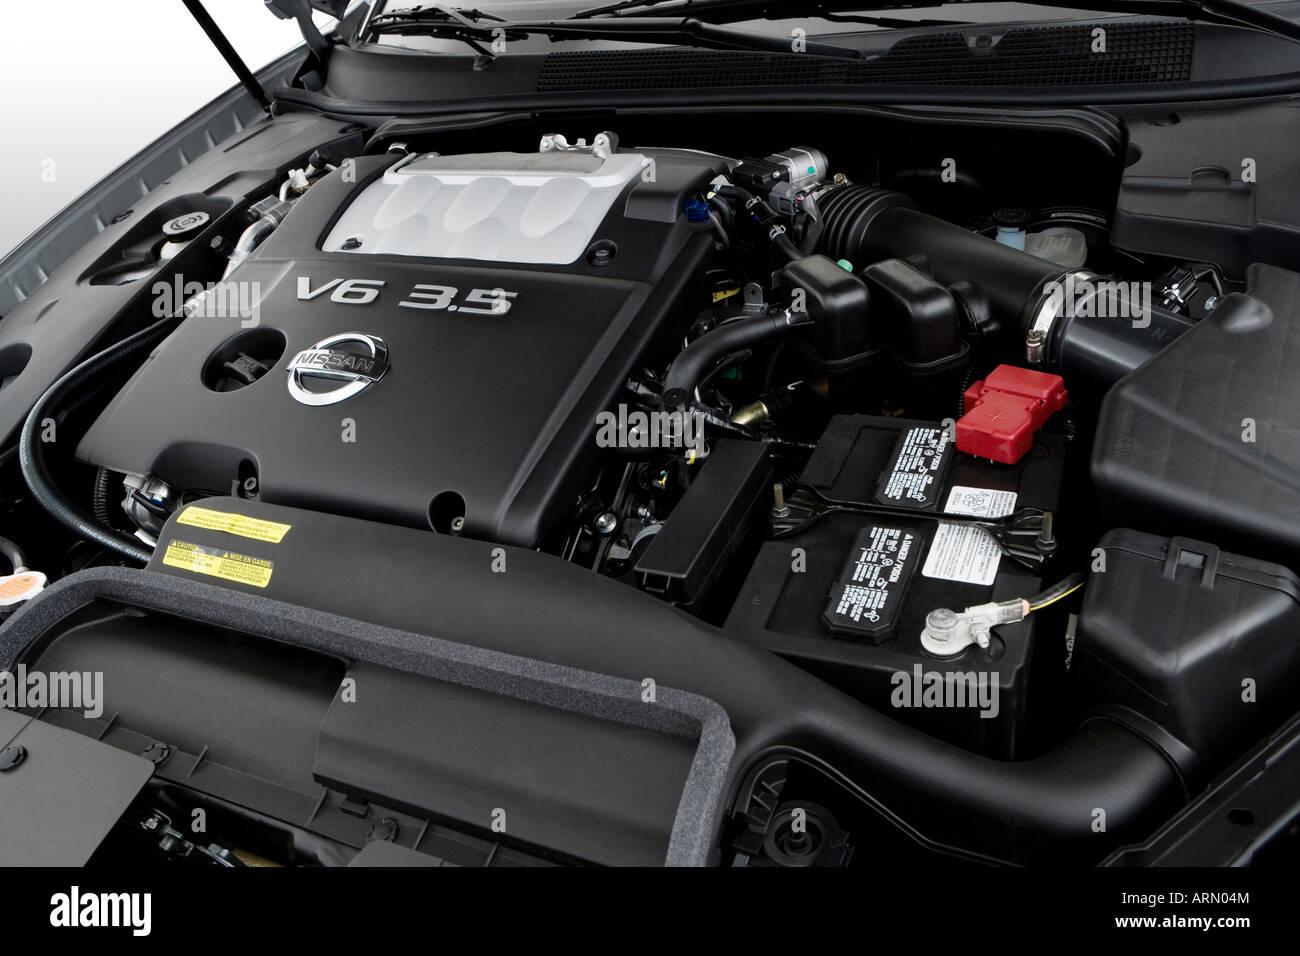 2008 nissan maxima 3.5 se in gray - engine stock photo, royalty